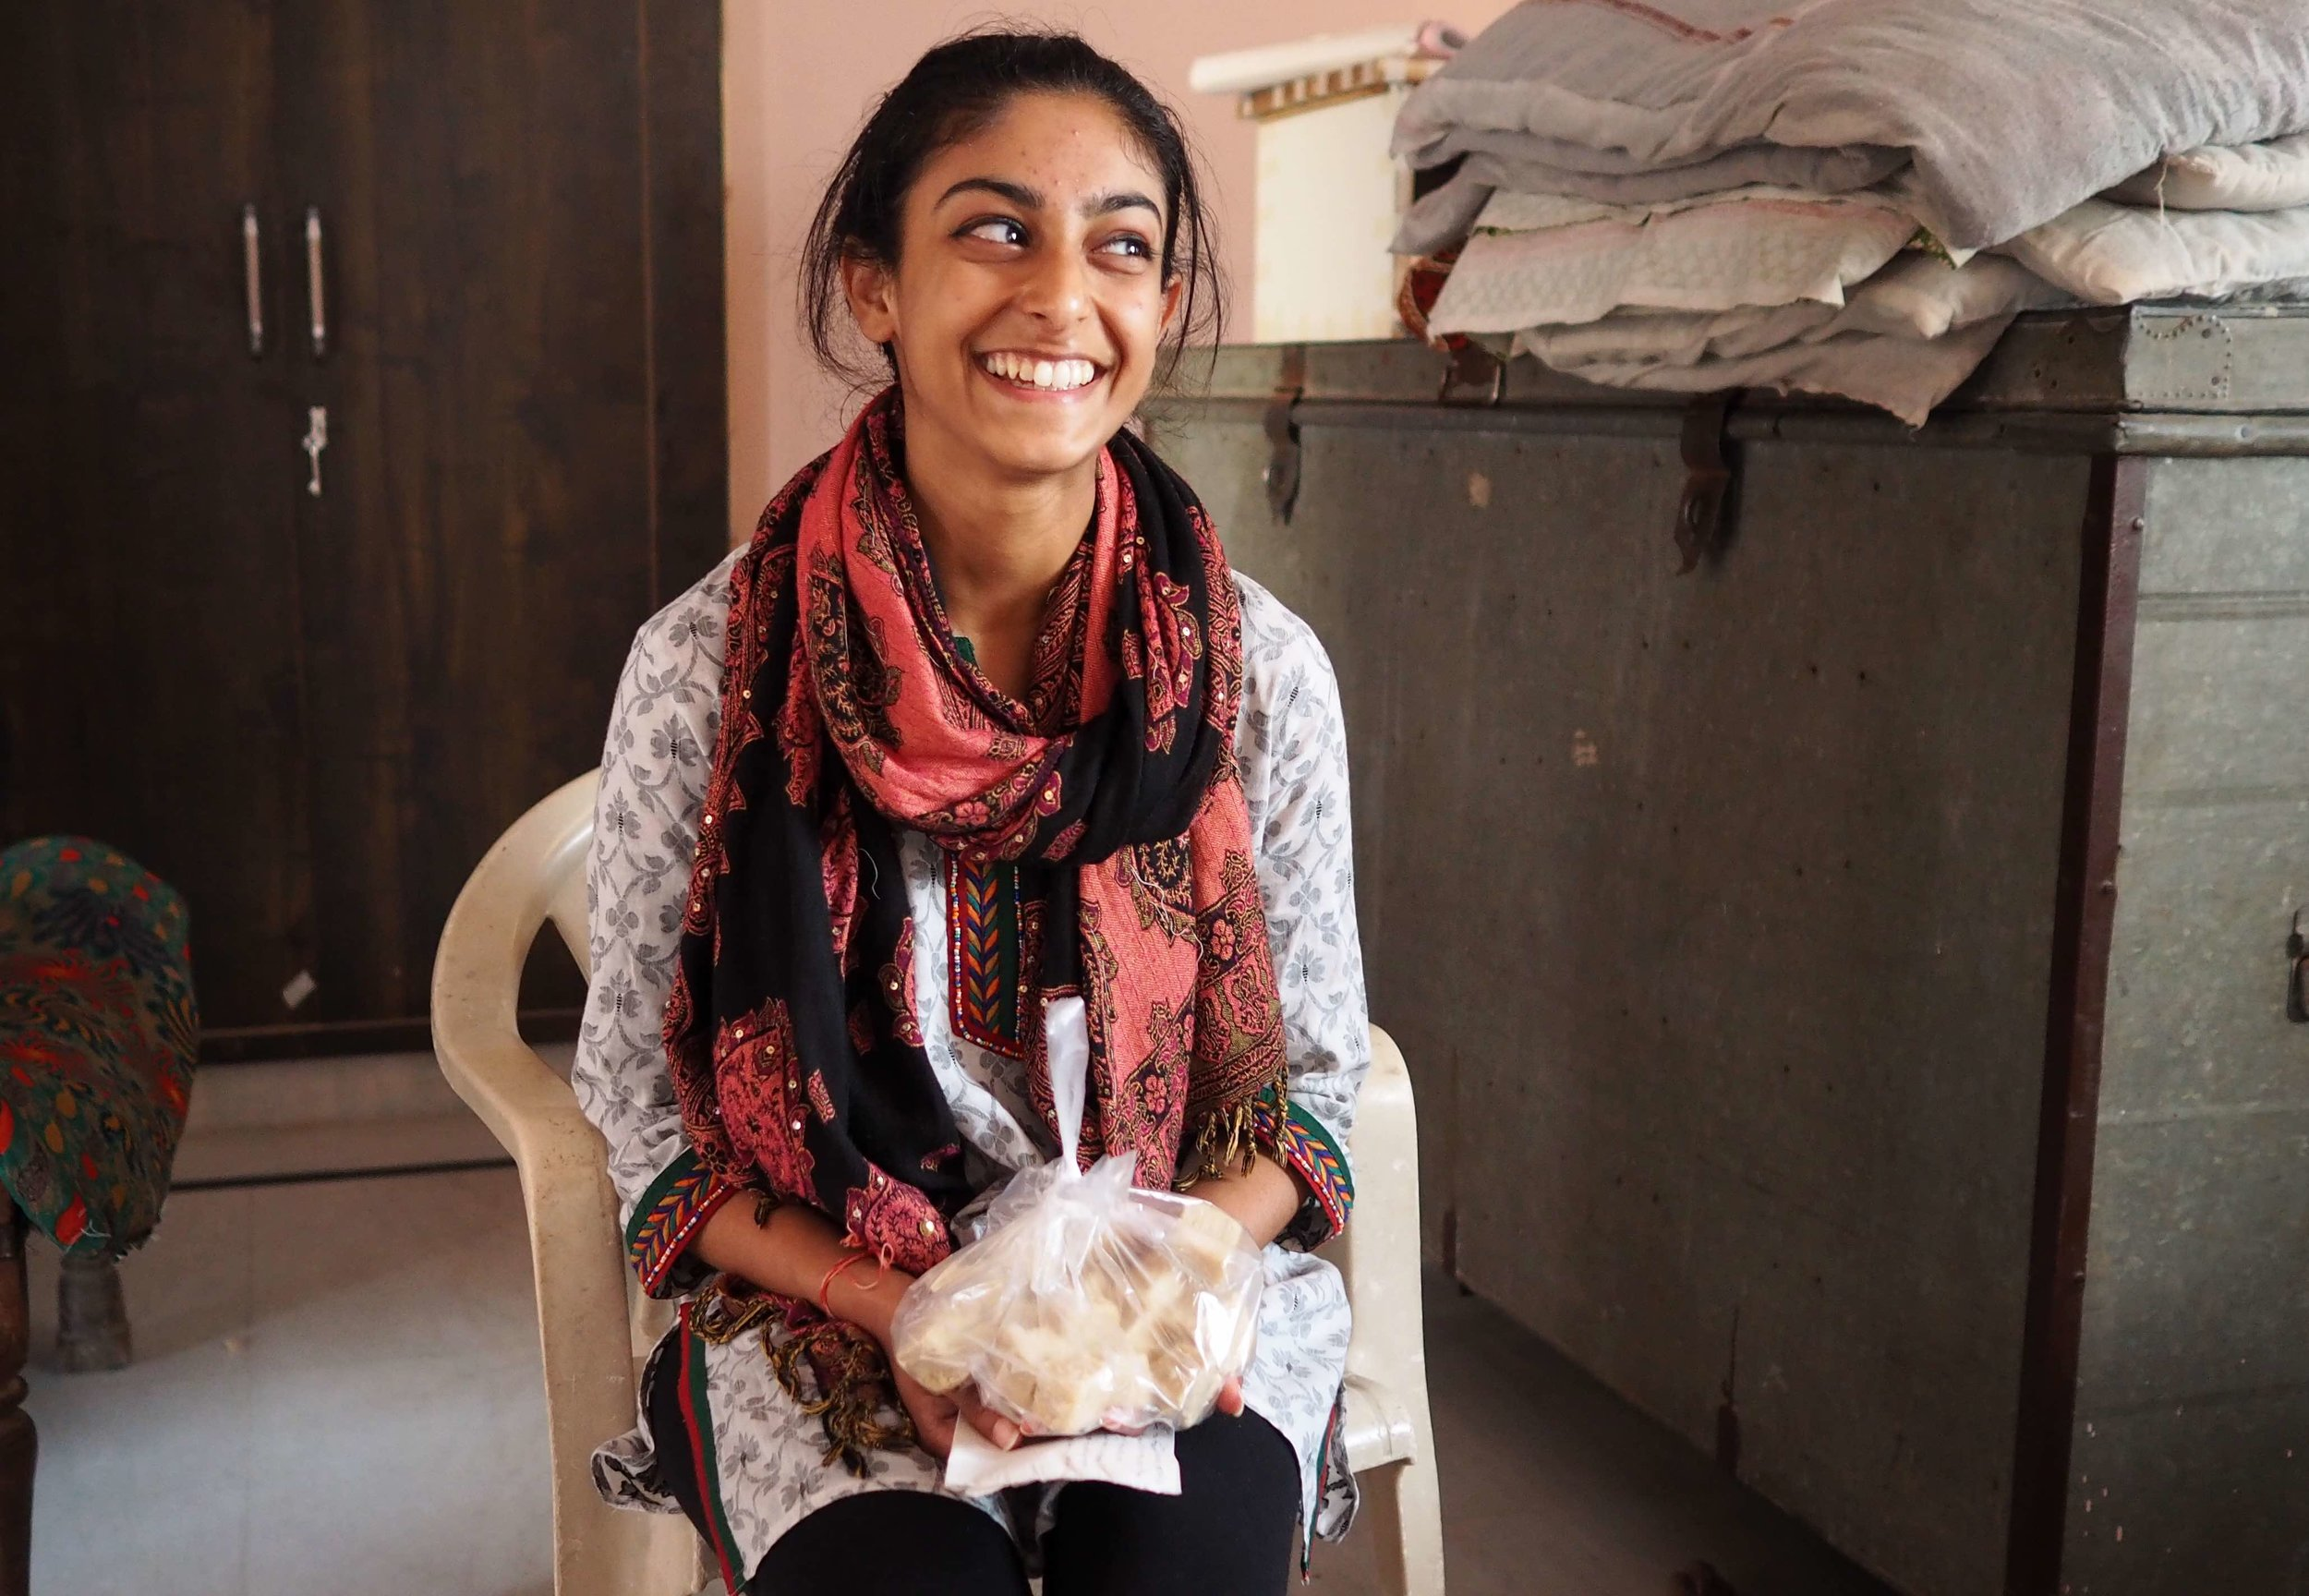 Radha-drishtee-immersion-nursing-student-empathy-training-storytelling 3.jpg